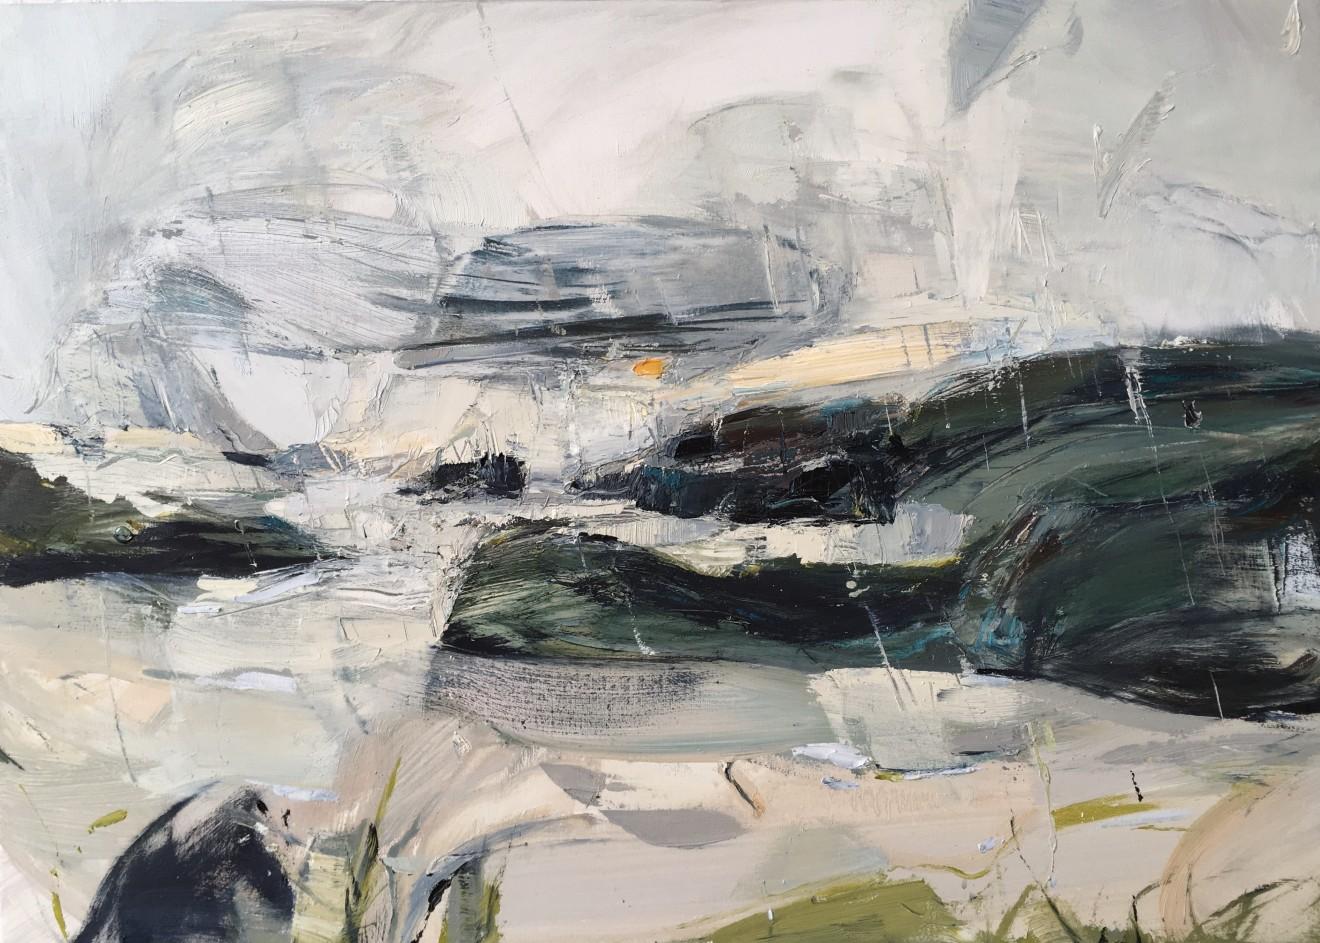 Beth Fletcher, Sleet from a White Sky